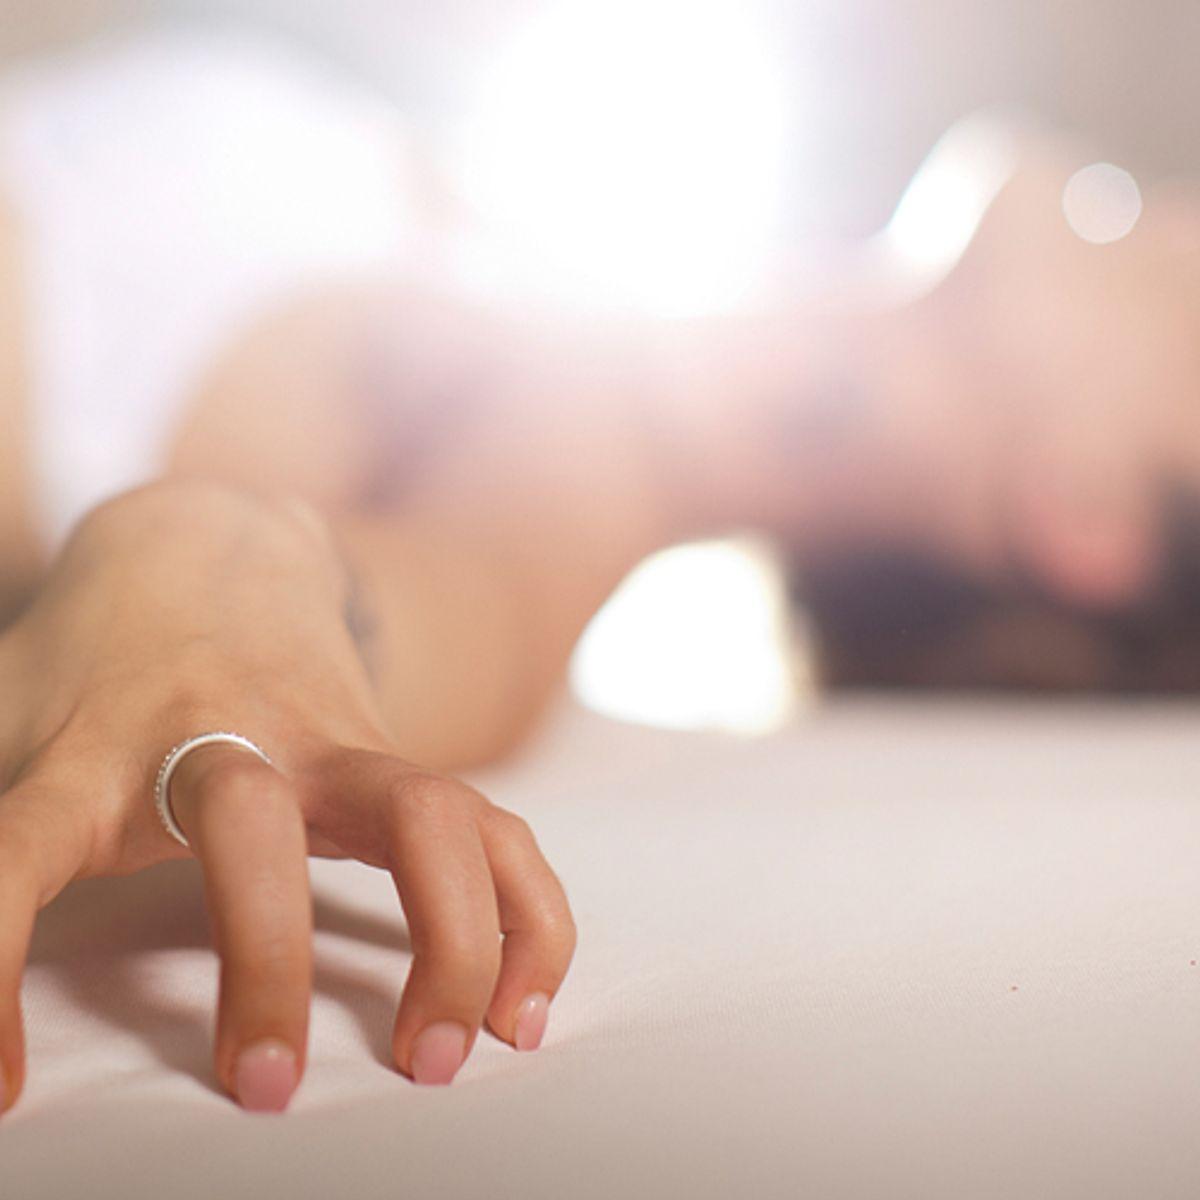 Hand masturbation senseless variant